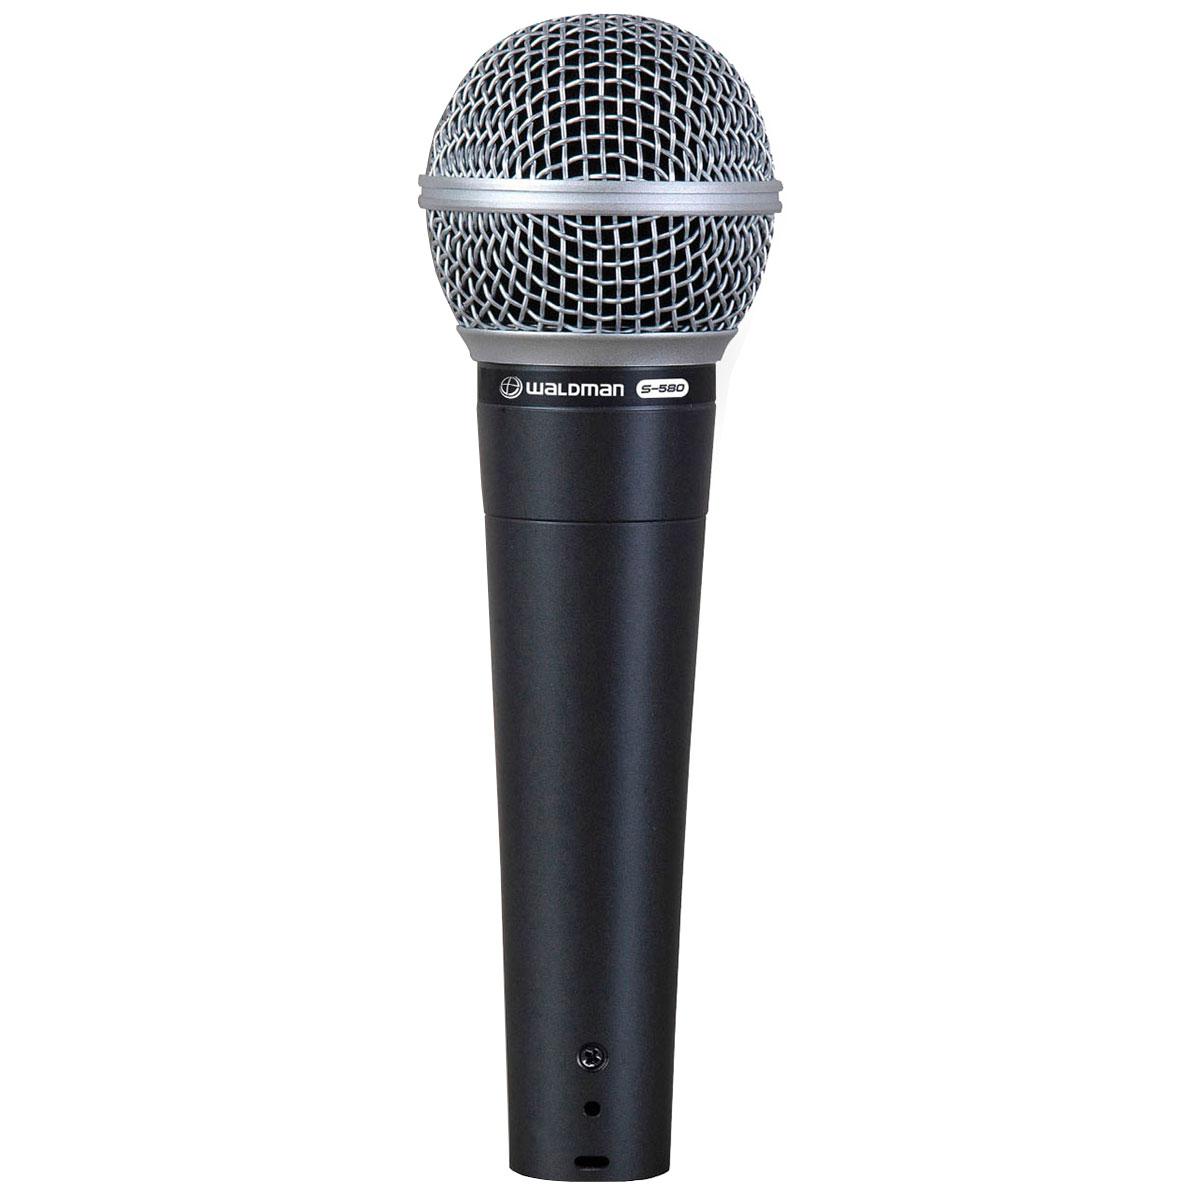 S2PM - Kit 2 Microfones c/ Fio Mão / Instrumento S2 PM - Waldman